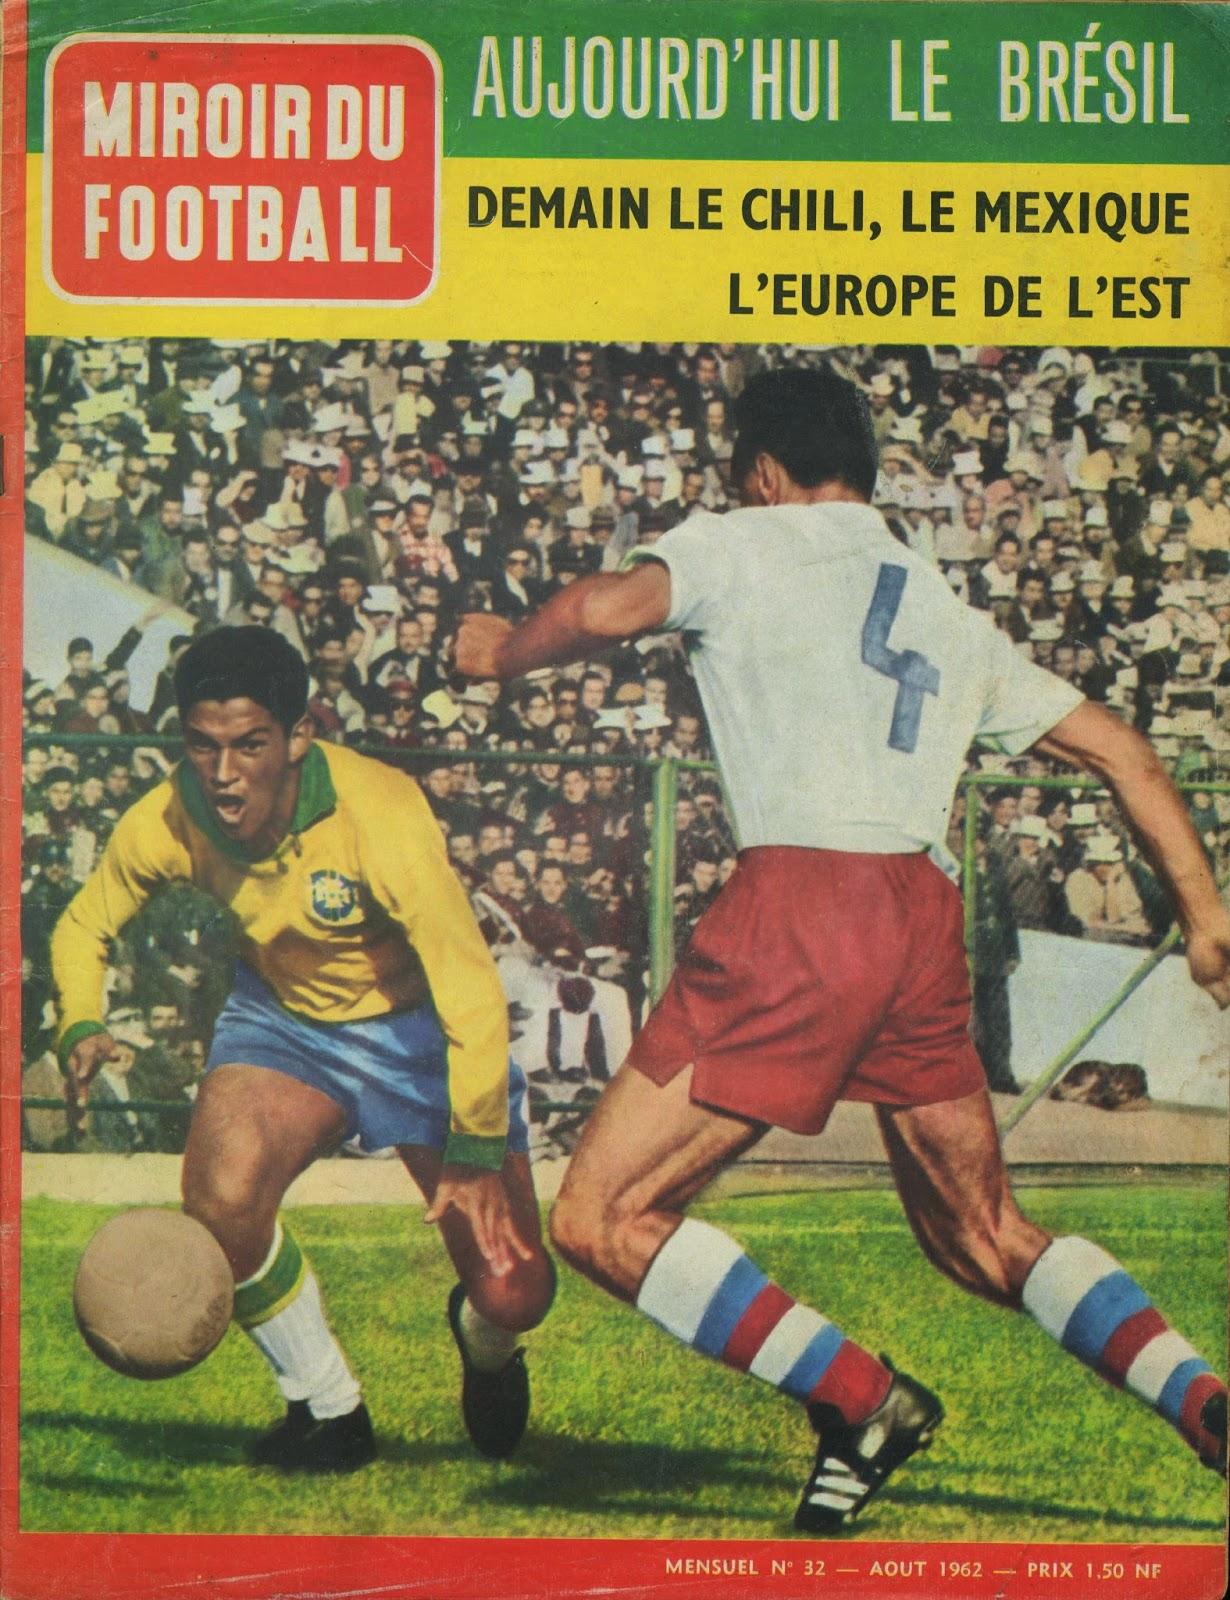 Soccer nostalgia full magazines part six for Le miroir des sports